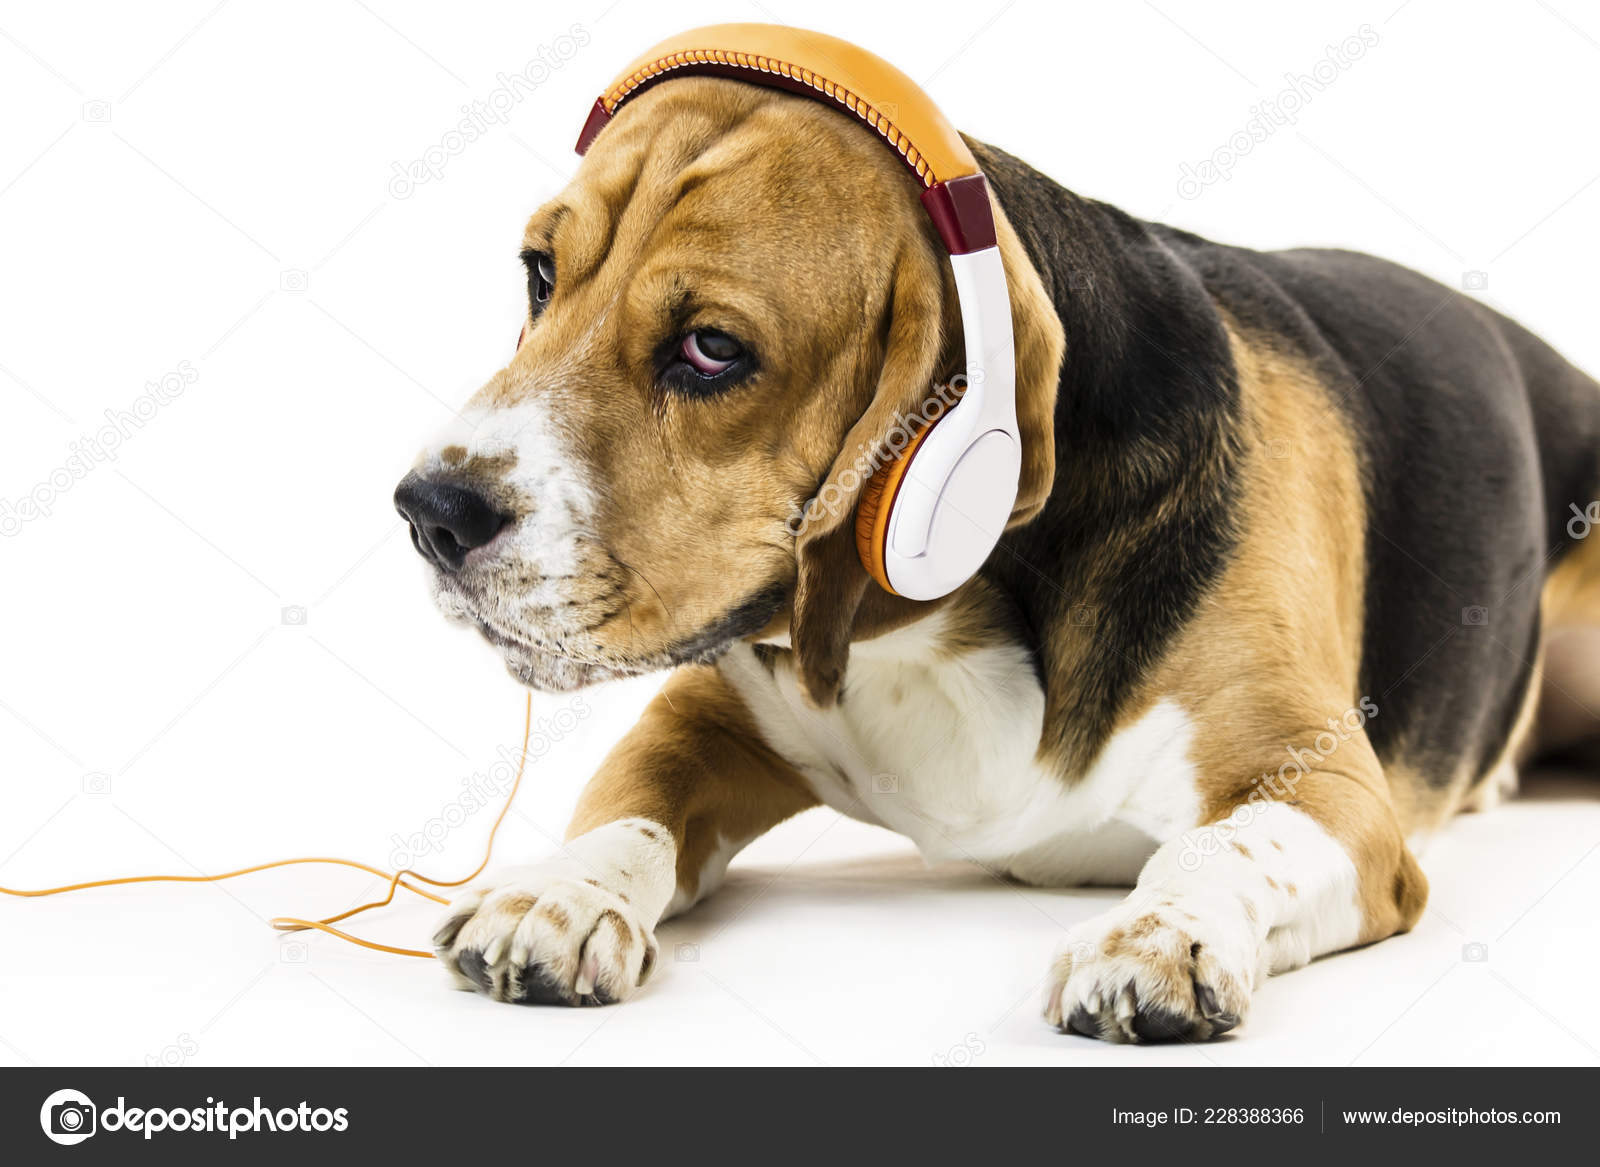 Funny Beagle Dog Headphones Listening Music White Background Stock Photo C Mikitiger 228388366